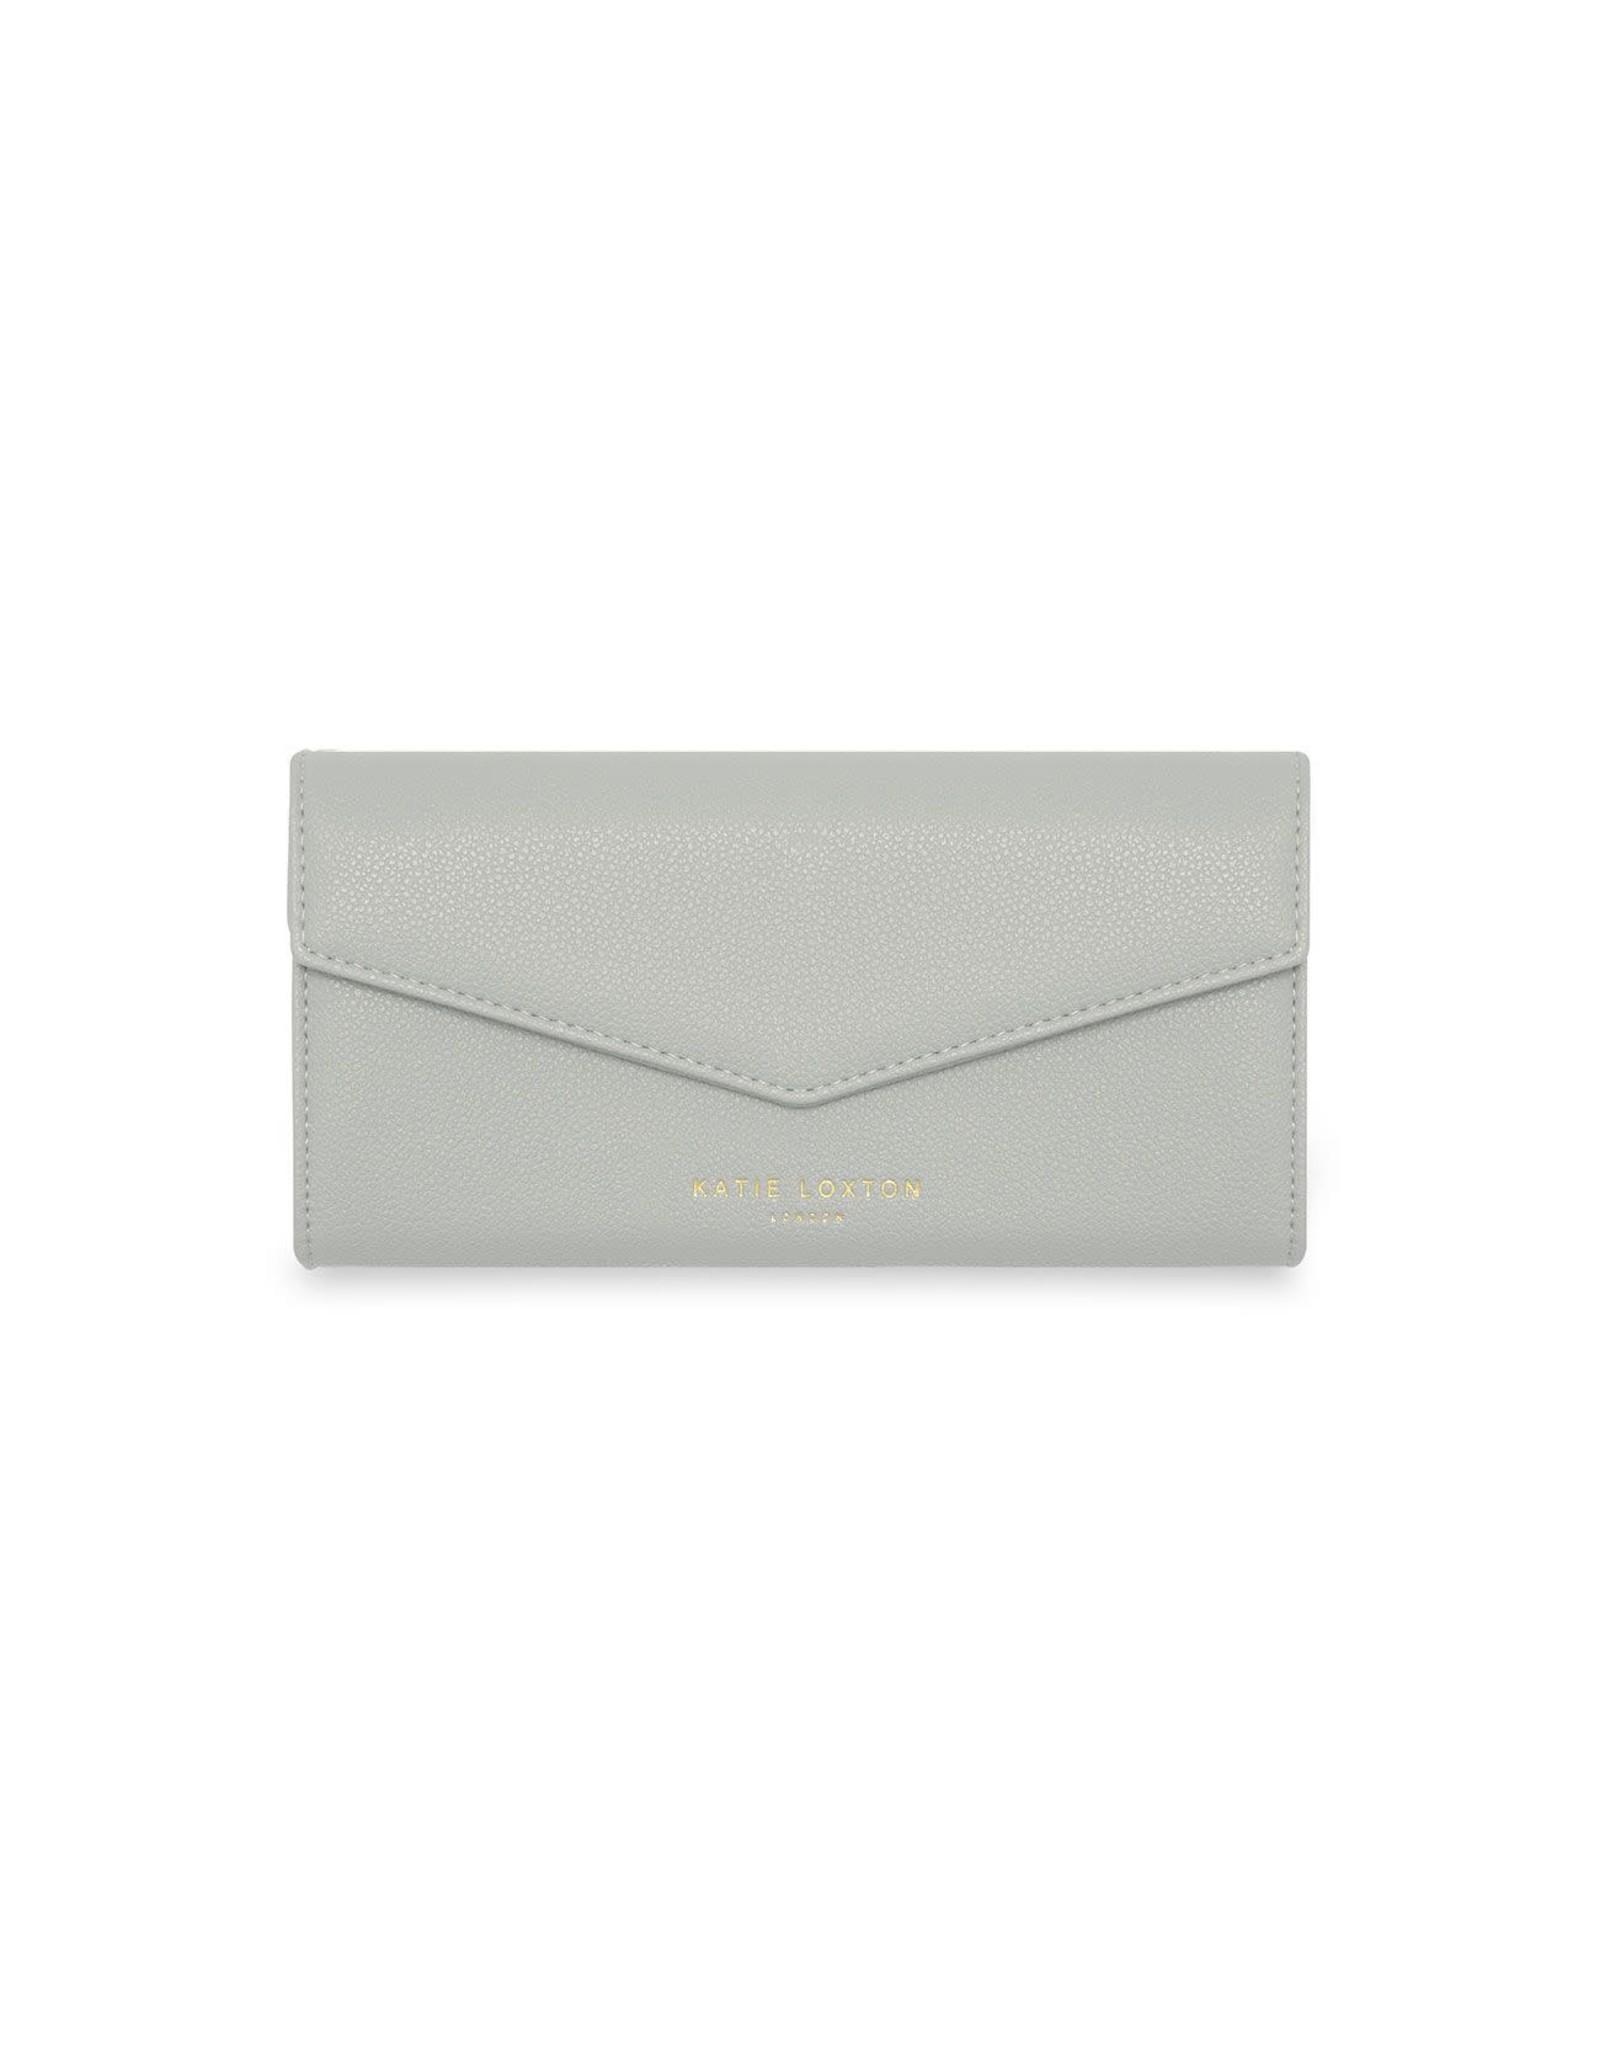 Katie Loxton Portefeuille - Esme Envelope - Money Money Money - Grijs